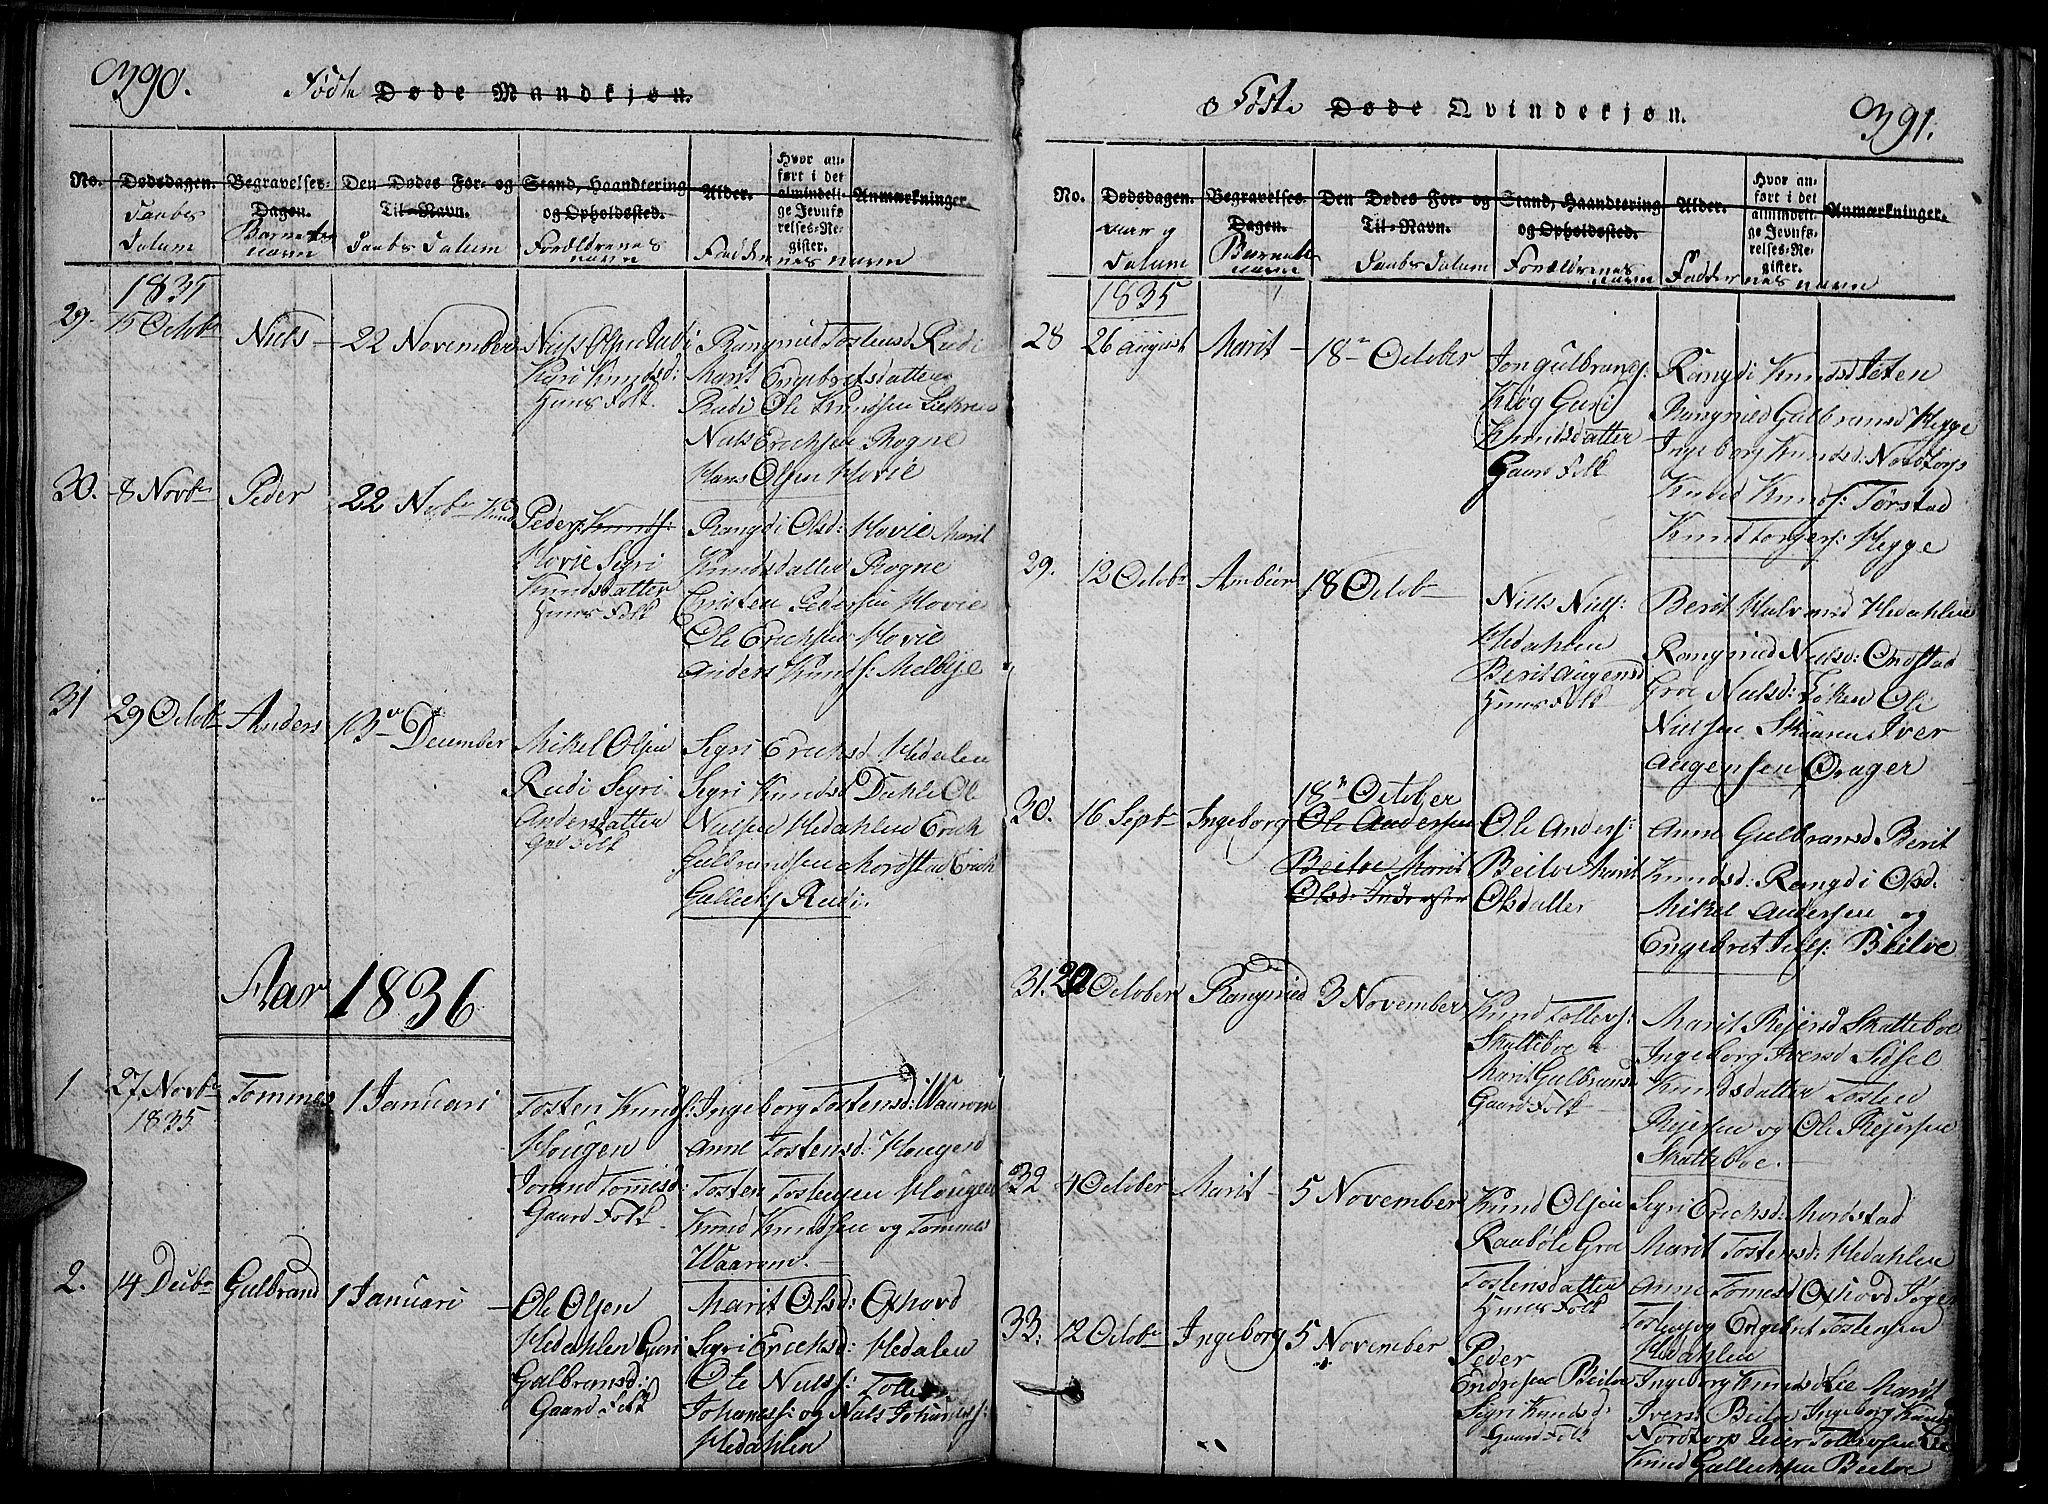 SAH, Slidre prestekontor, Klokkerbok nr. 2, 1814-1839, s. 390-391